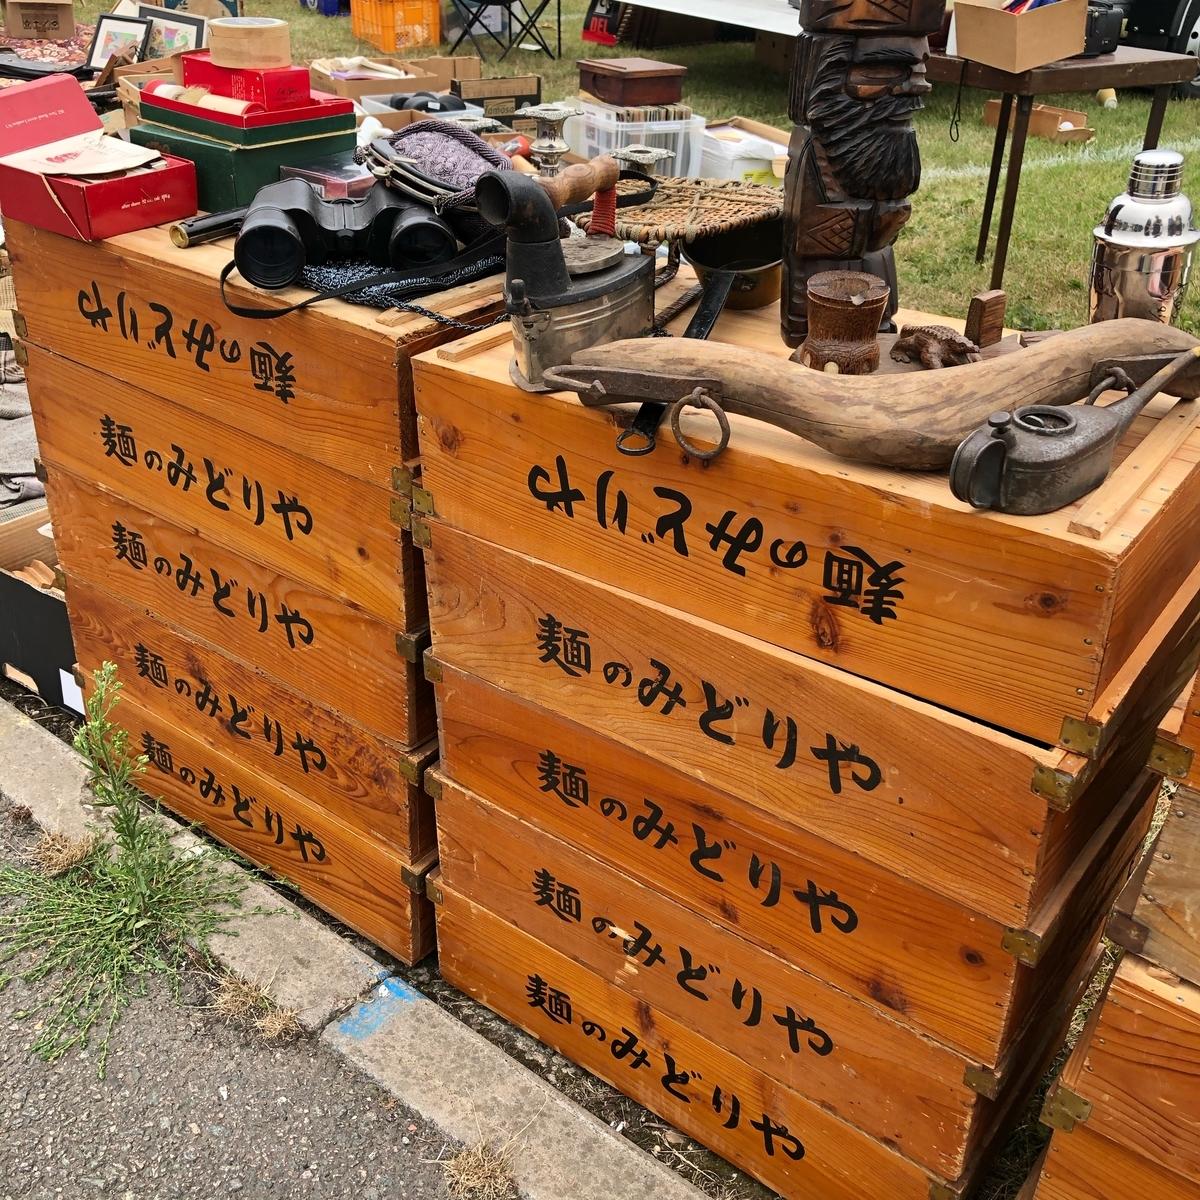 f:id:Iwashi-Tumire:20201003083327j:plain